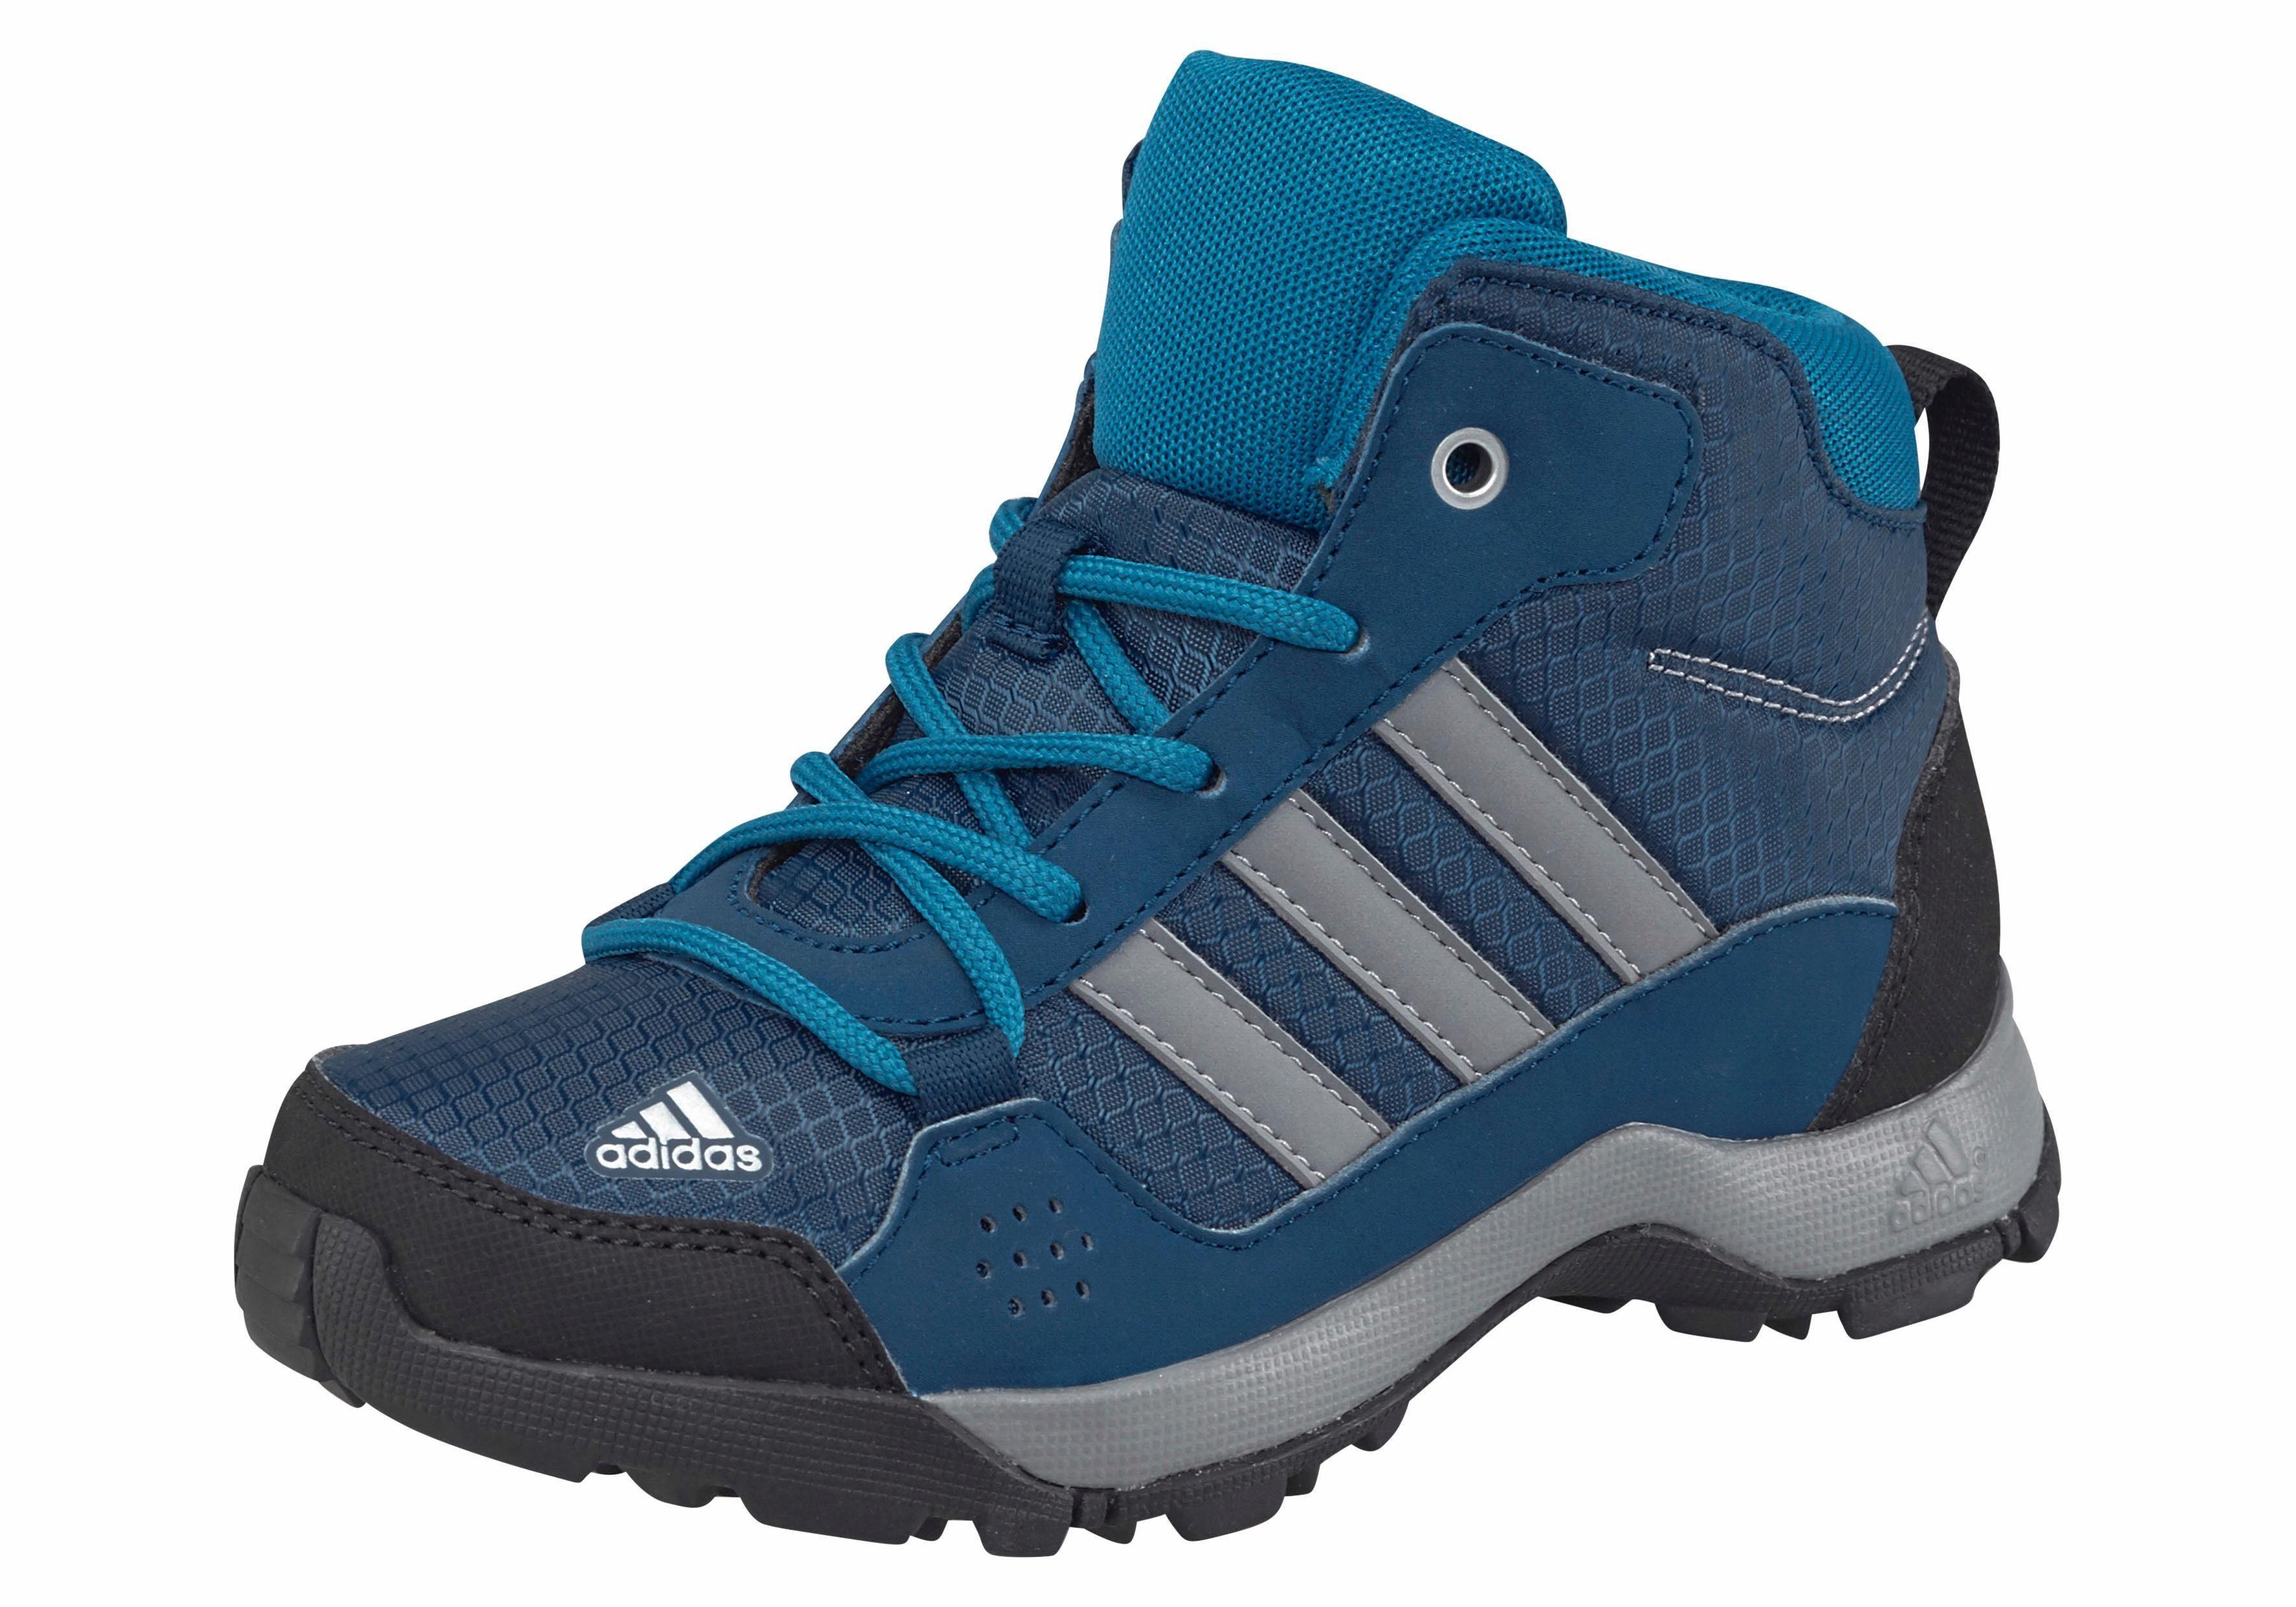 Adidas Outdoorschoenen Kinderen De »hyperhiker J« In Online84046ce80ec9747bcc8f141d18cc3266 Performance wOPk8n0